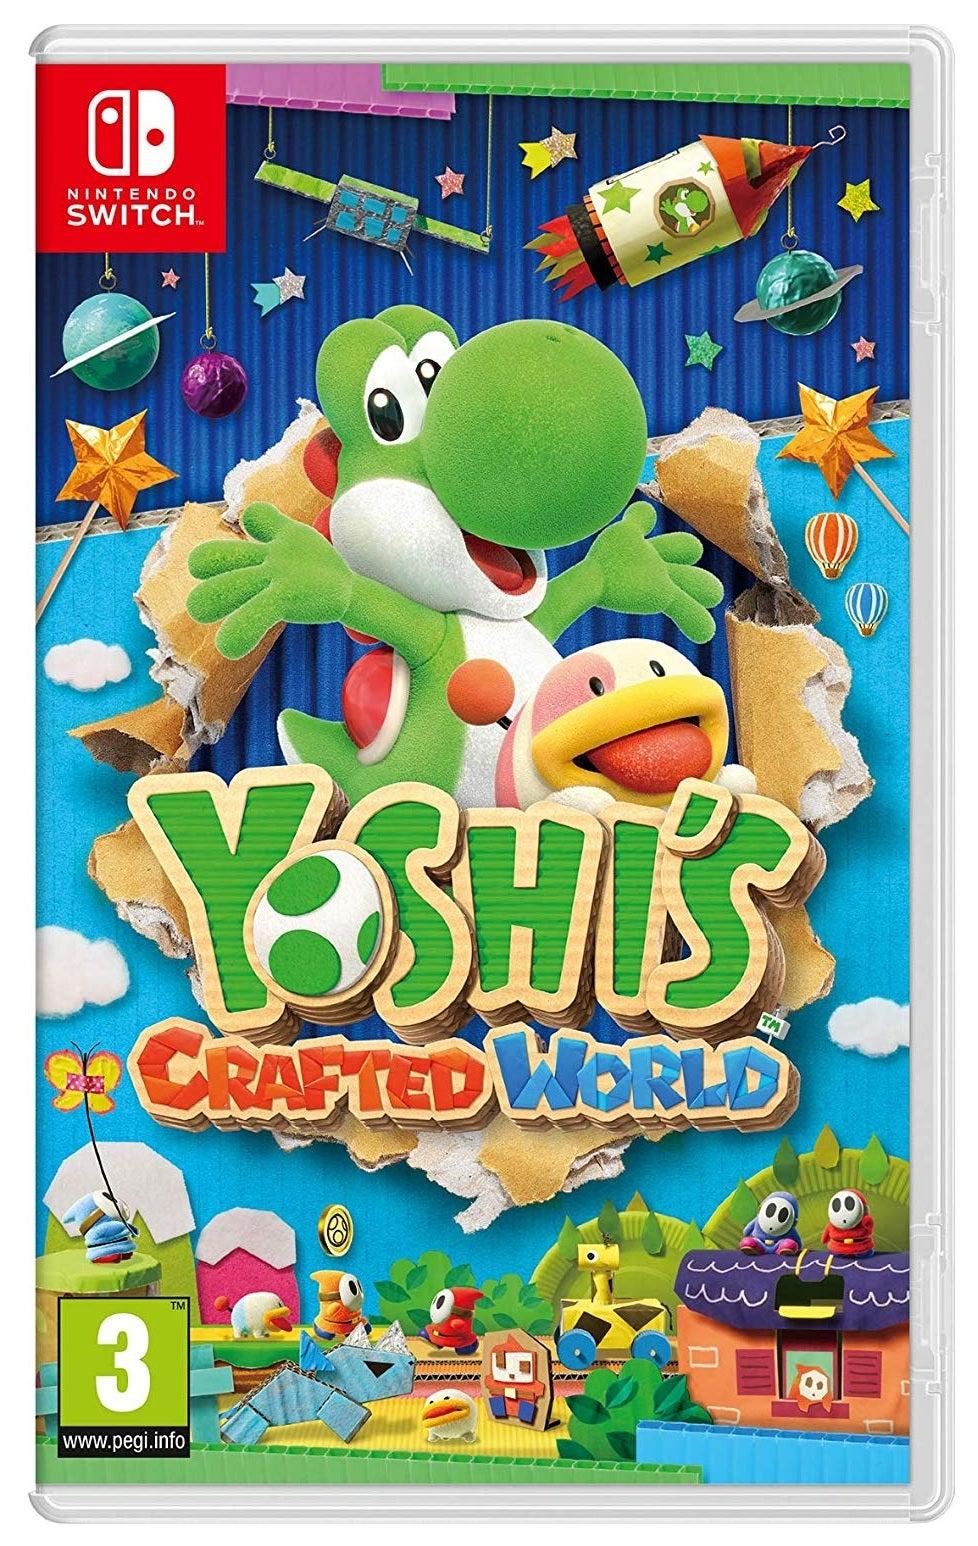 Nintendo Yoshis Crafted World Nintendo Switch Game